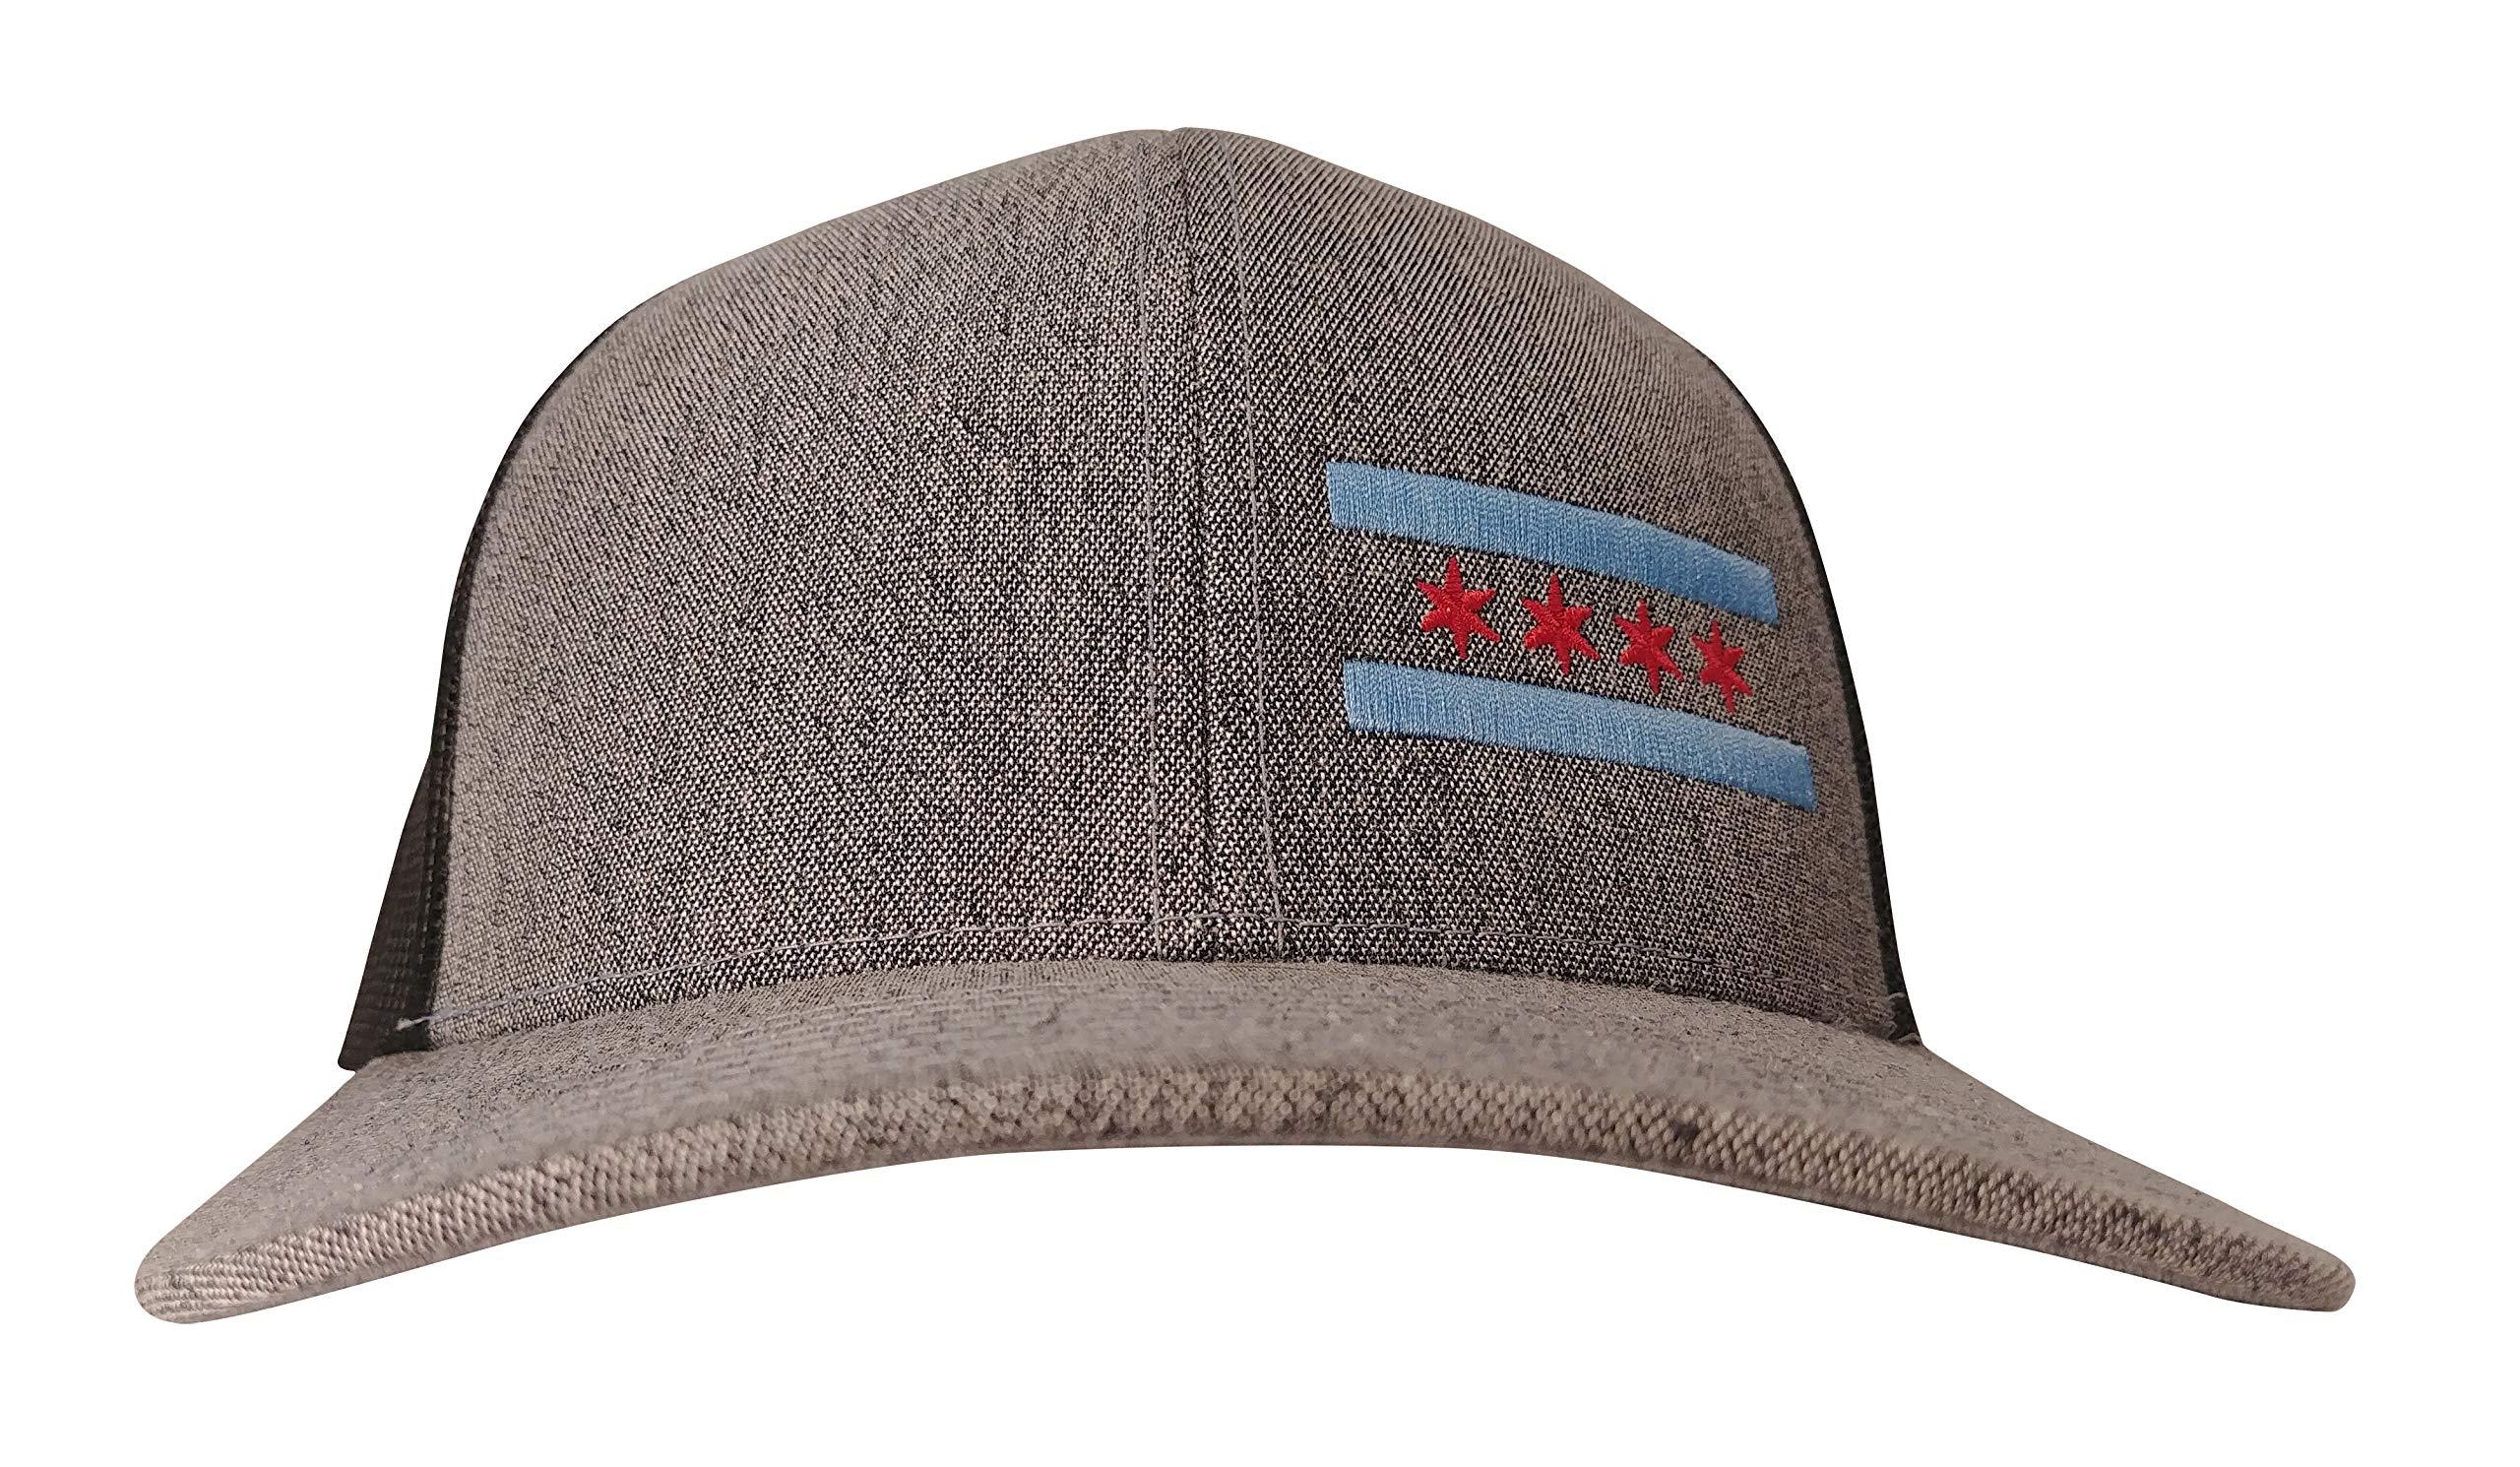 cba09de0dd1 Chicago Flag Embroidered Trucker Hat Medium Profile Curved Brim (Heather  Grey Black)